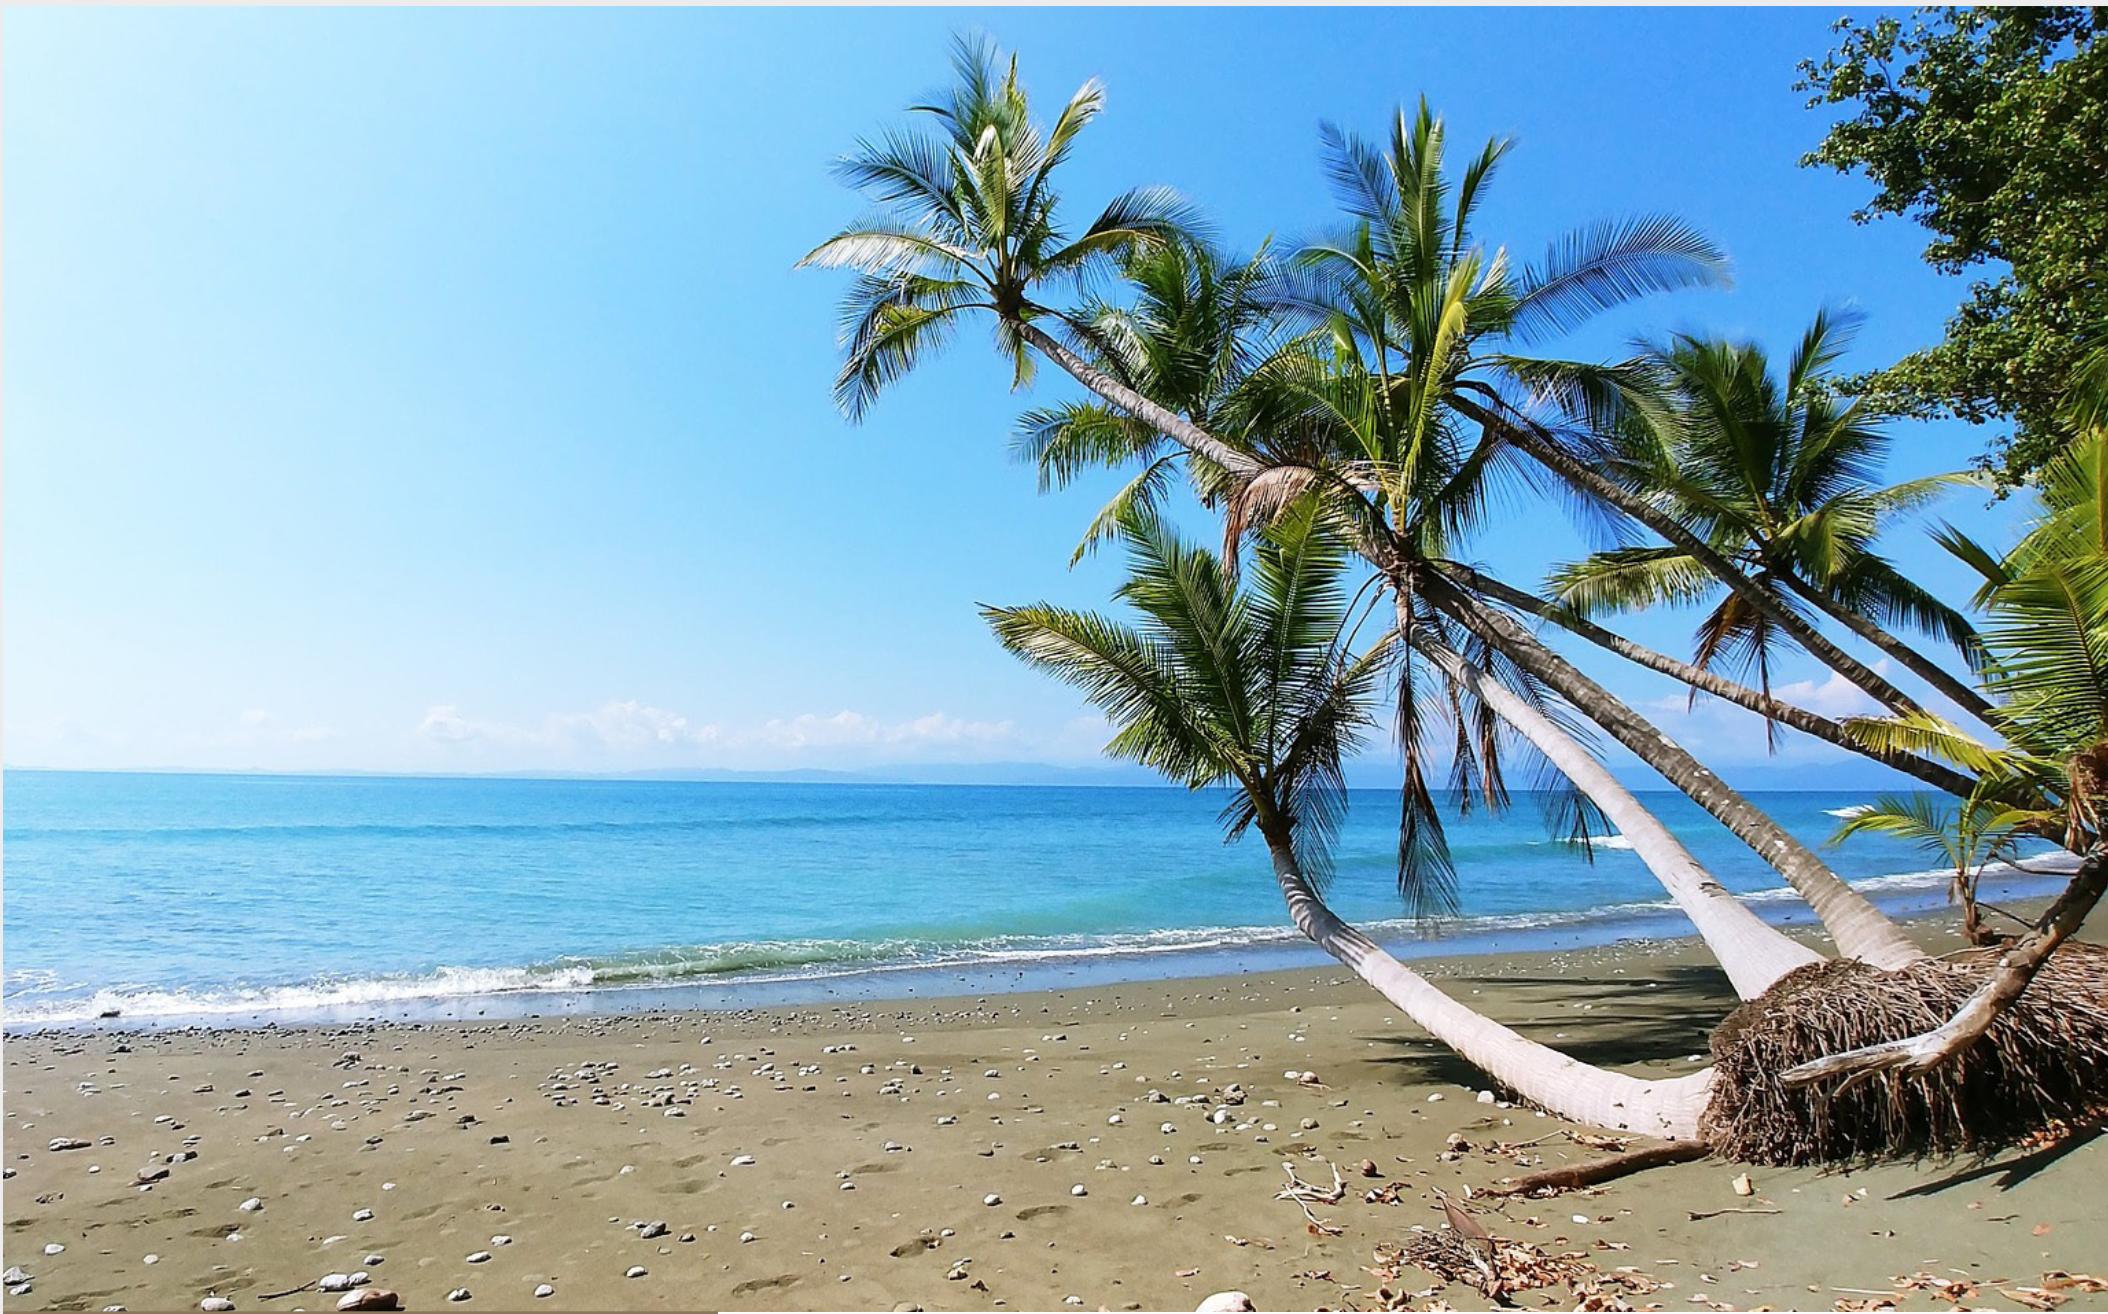 Enjoy the Beach